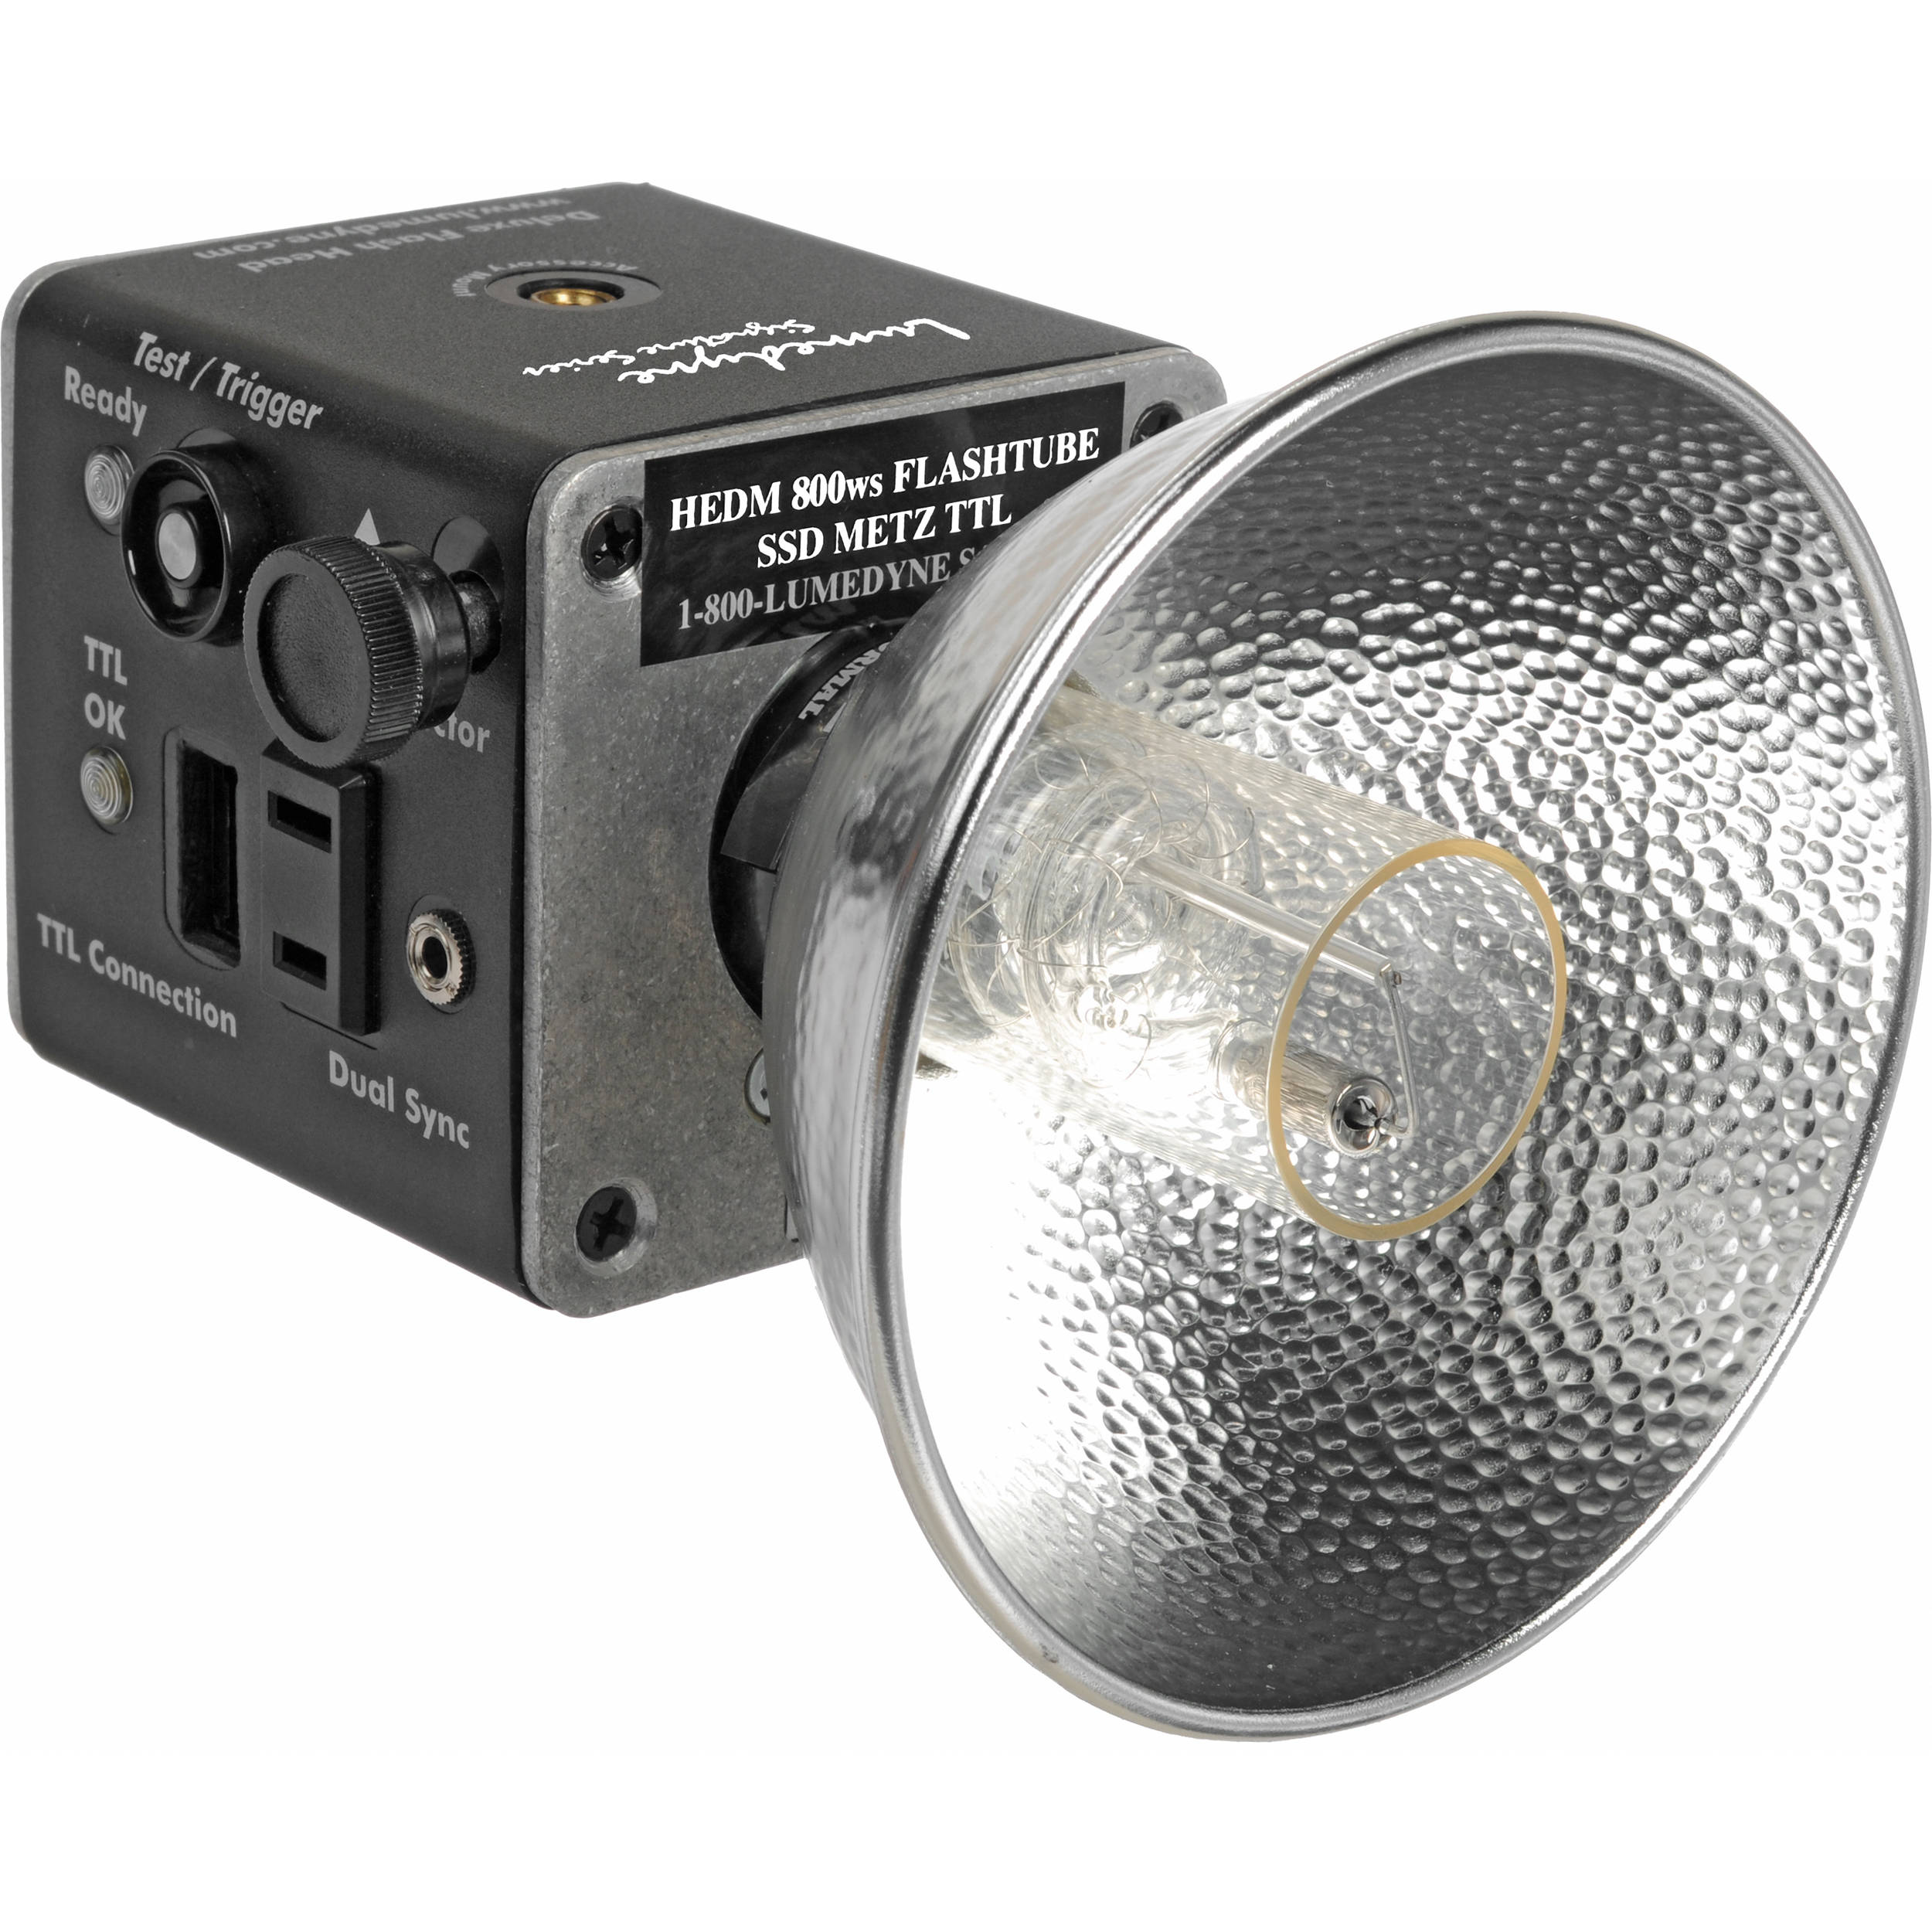 Lumedyne 800w flash head w//modeling light